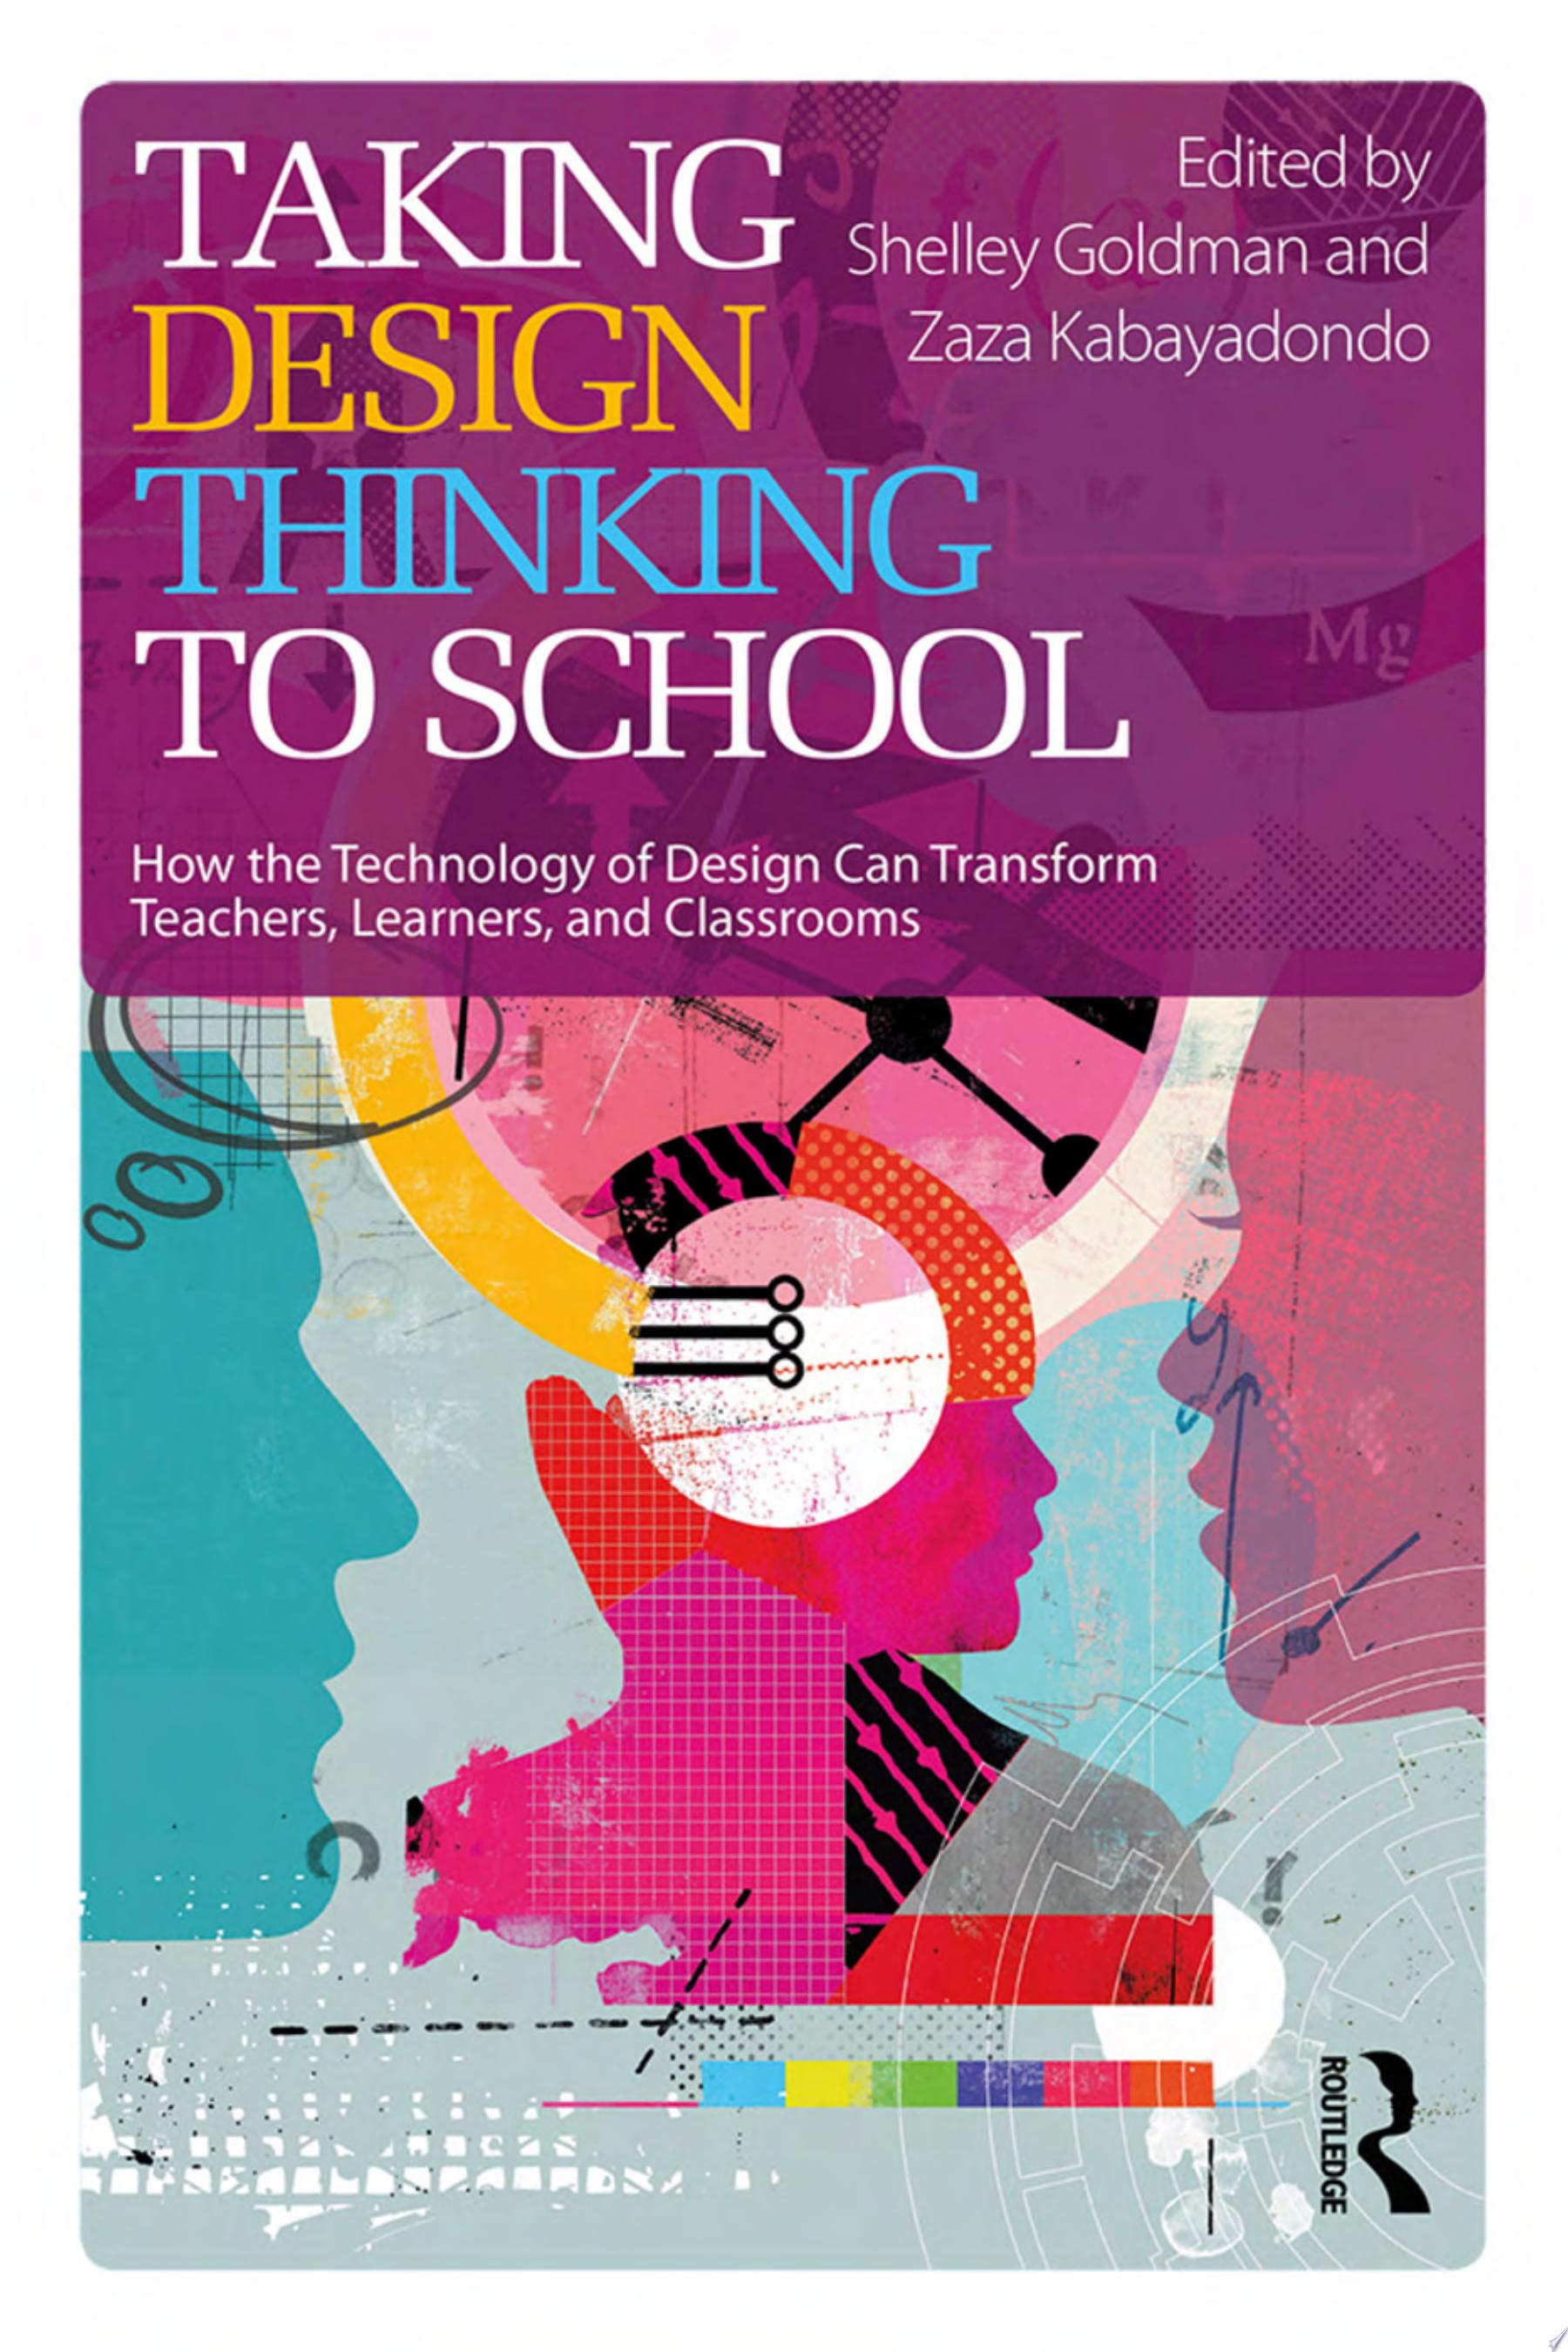 Taking Design Thinking to School